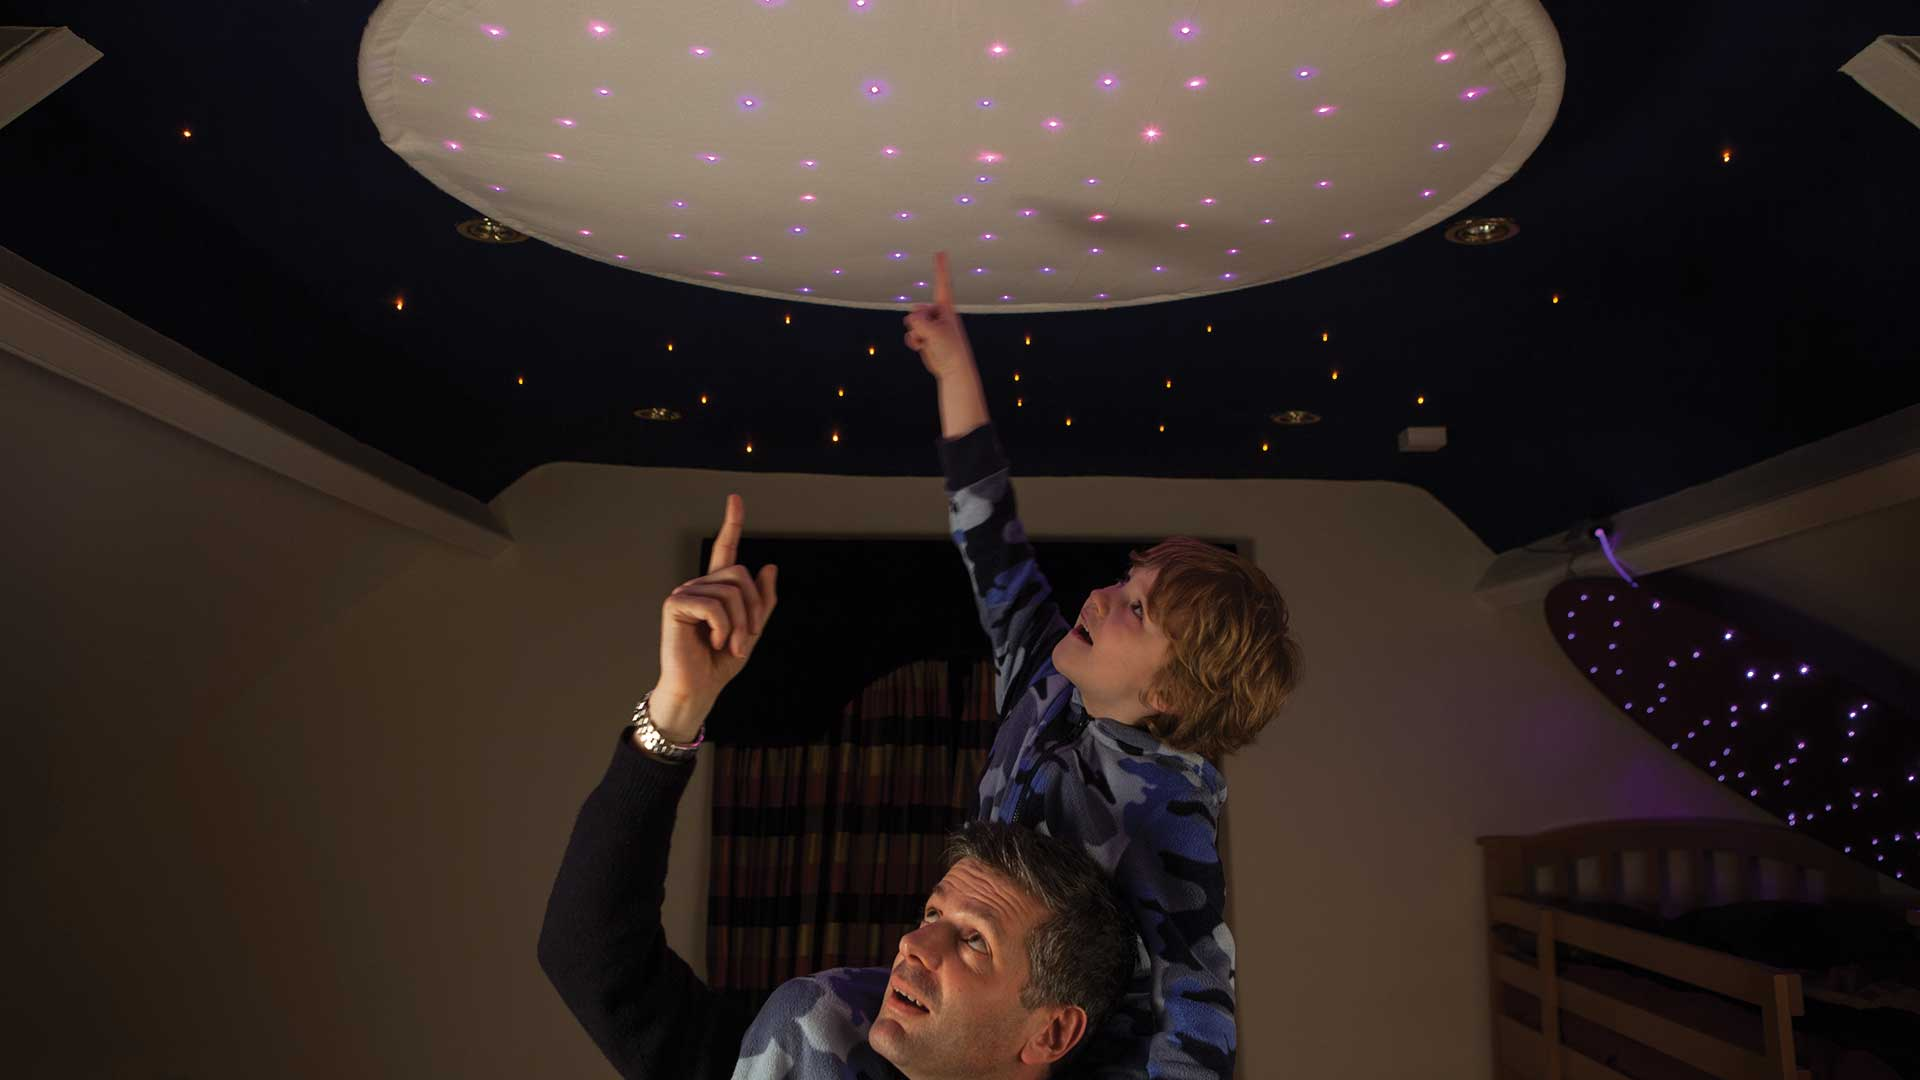 fiber optic lighting sensory lighting